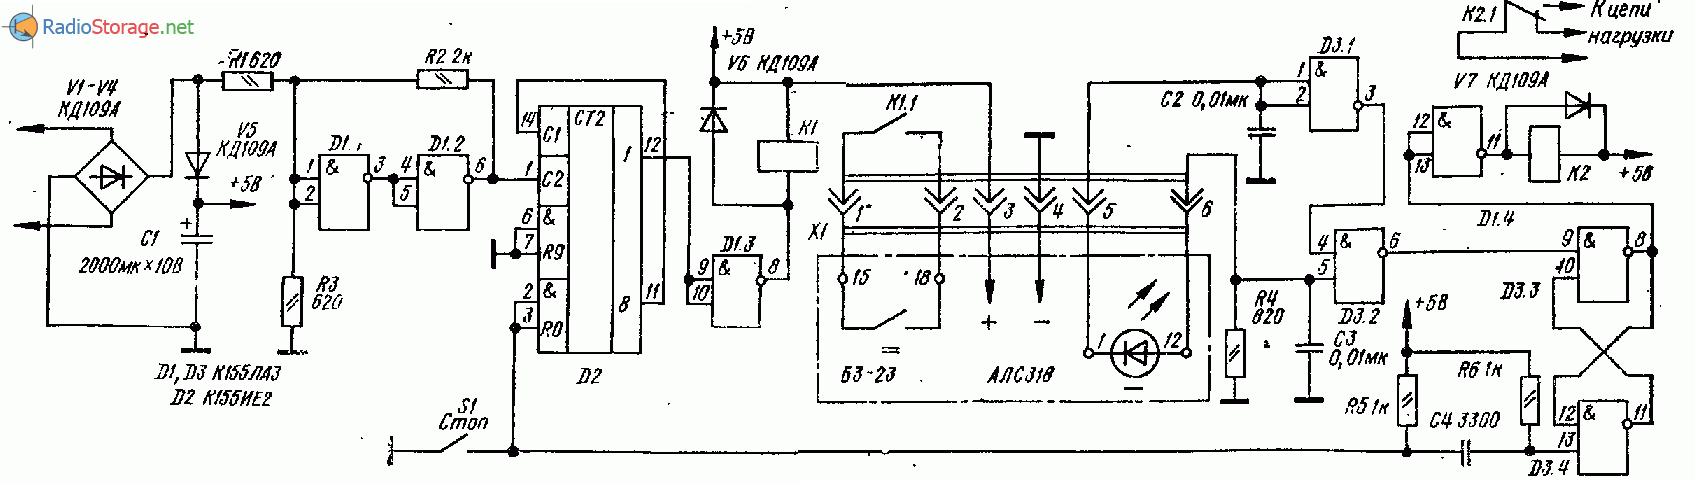 схема металлоискателя приставка